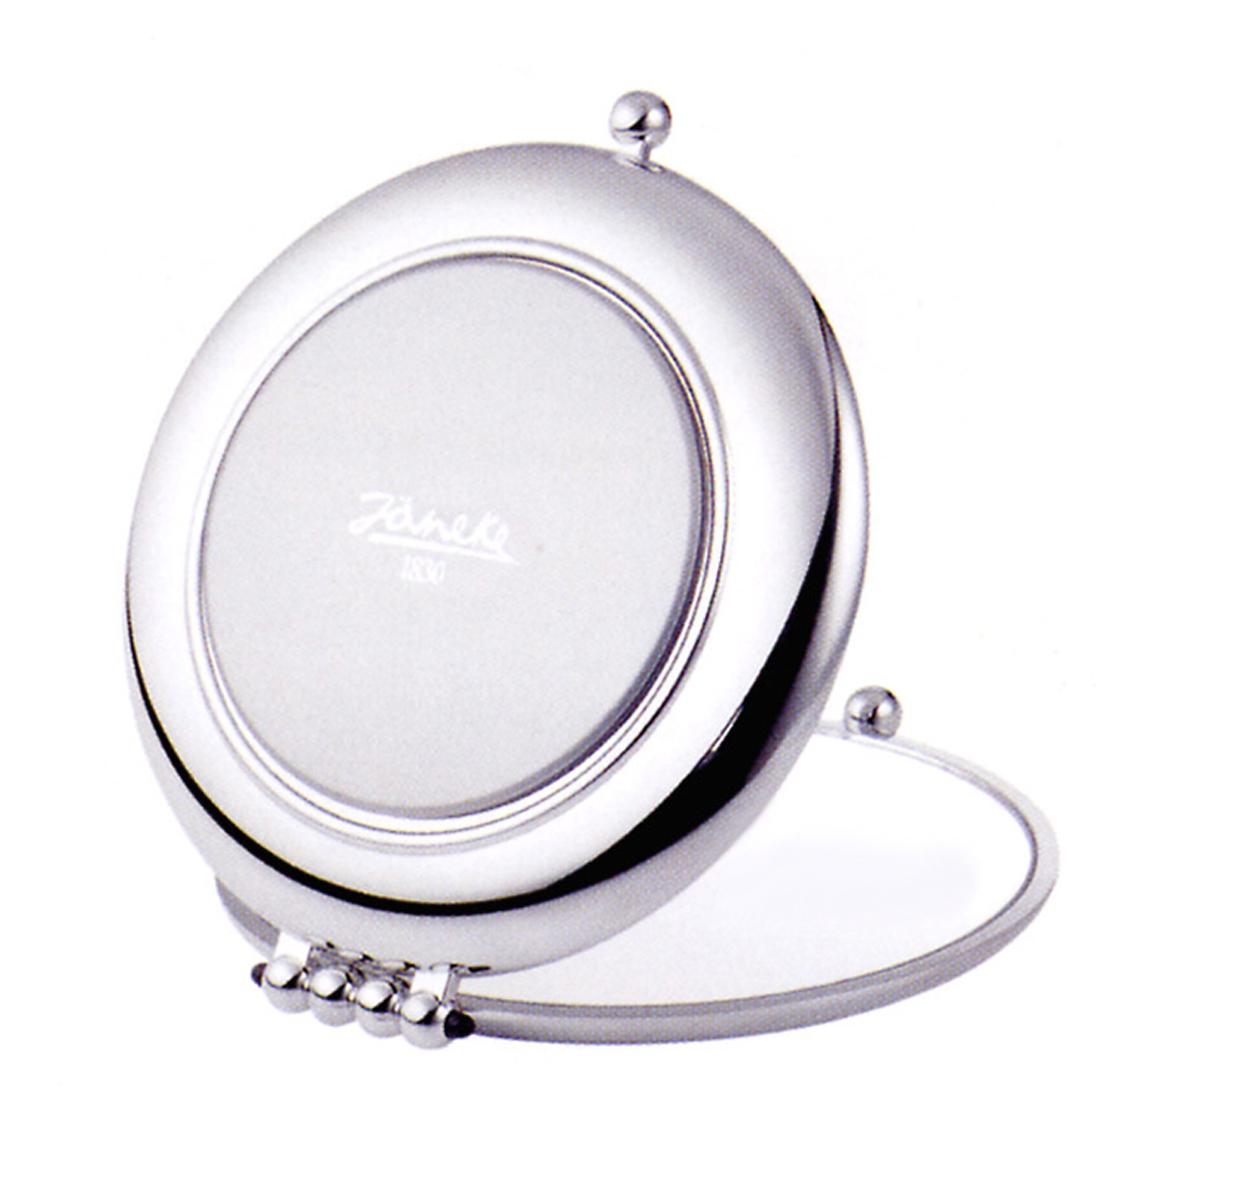 Janeke Зеркало алюминиевое в упаковке D90, AL453.3. 573240